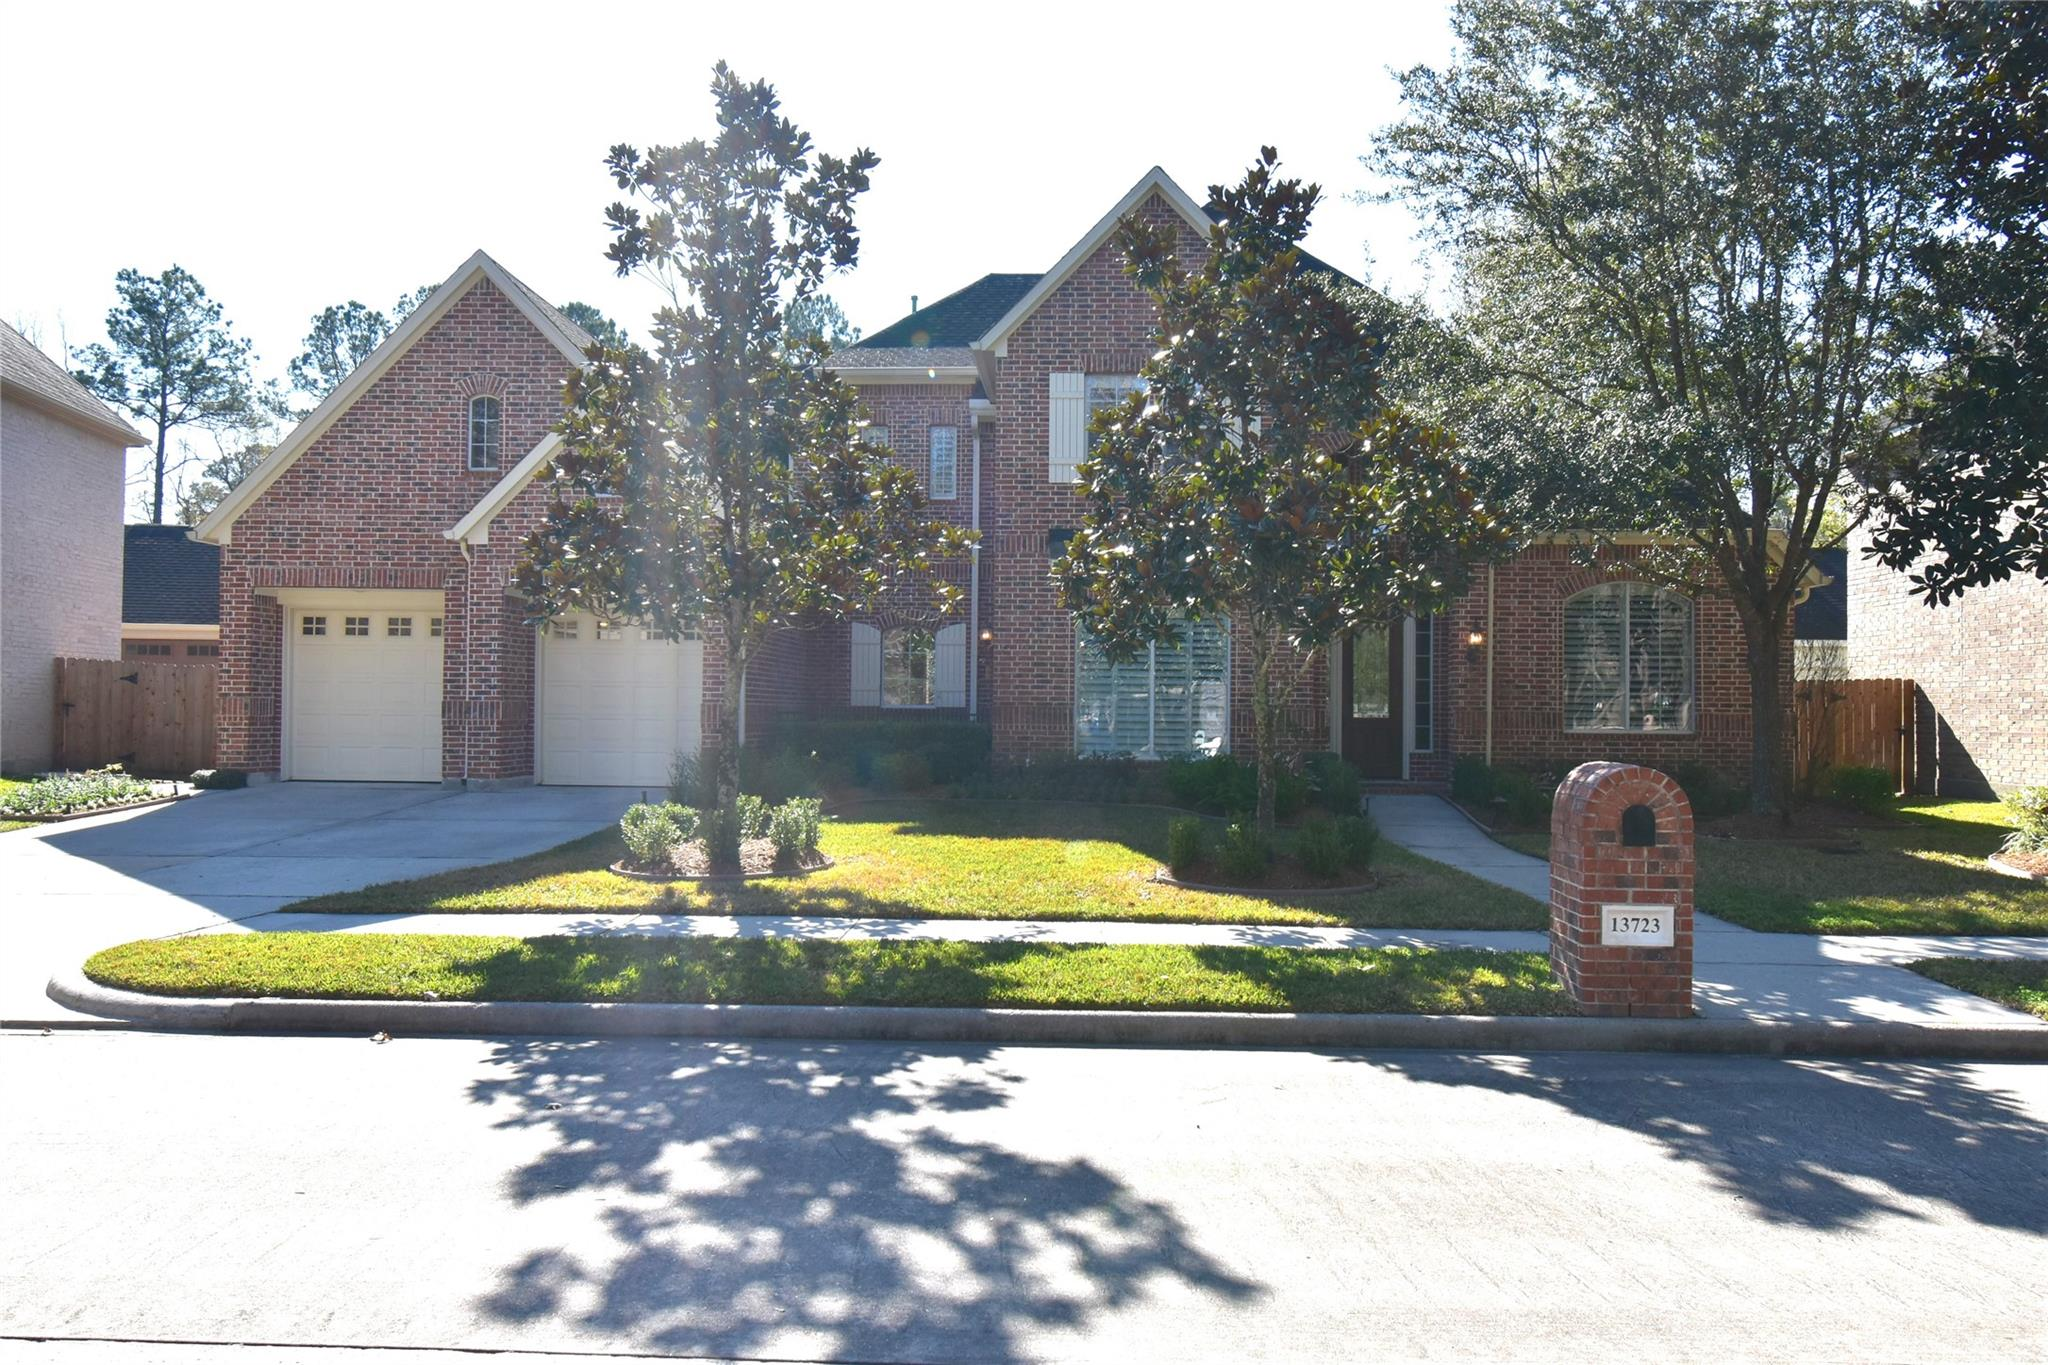 13723 Greenwood Lane S Property Photo - Houston, TX real estate listing